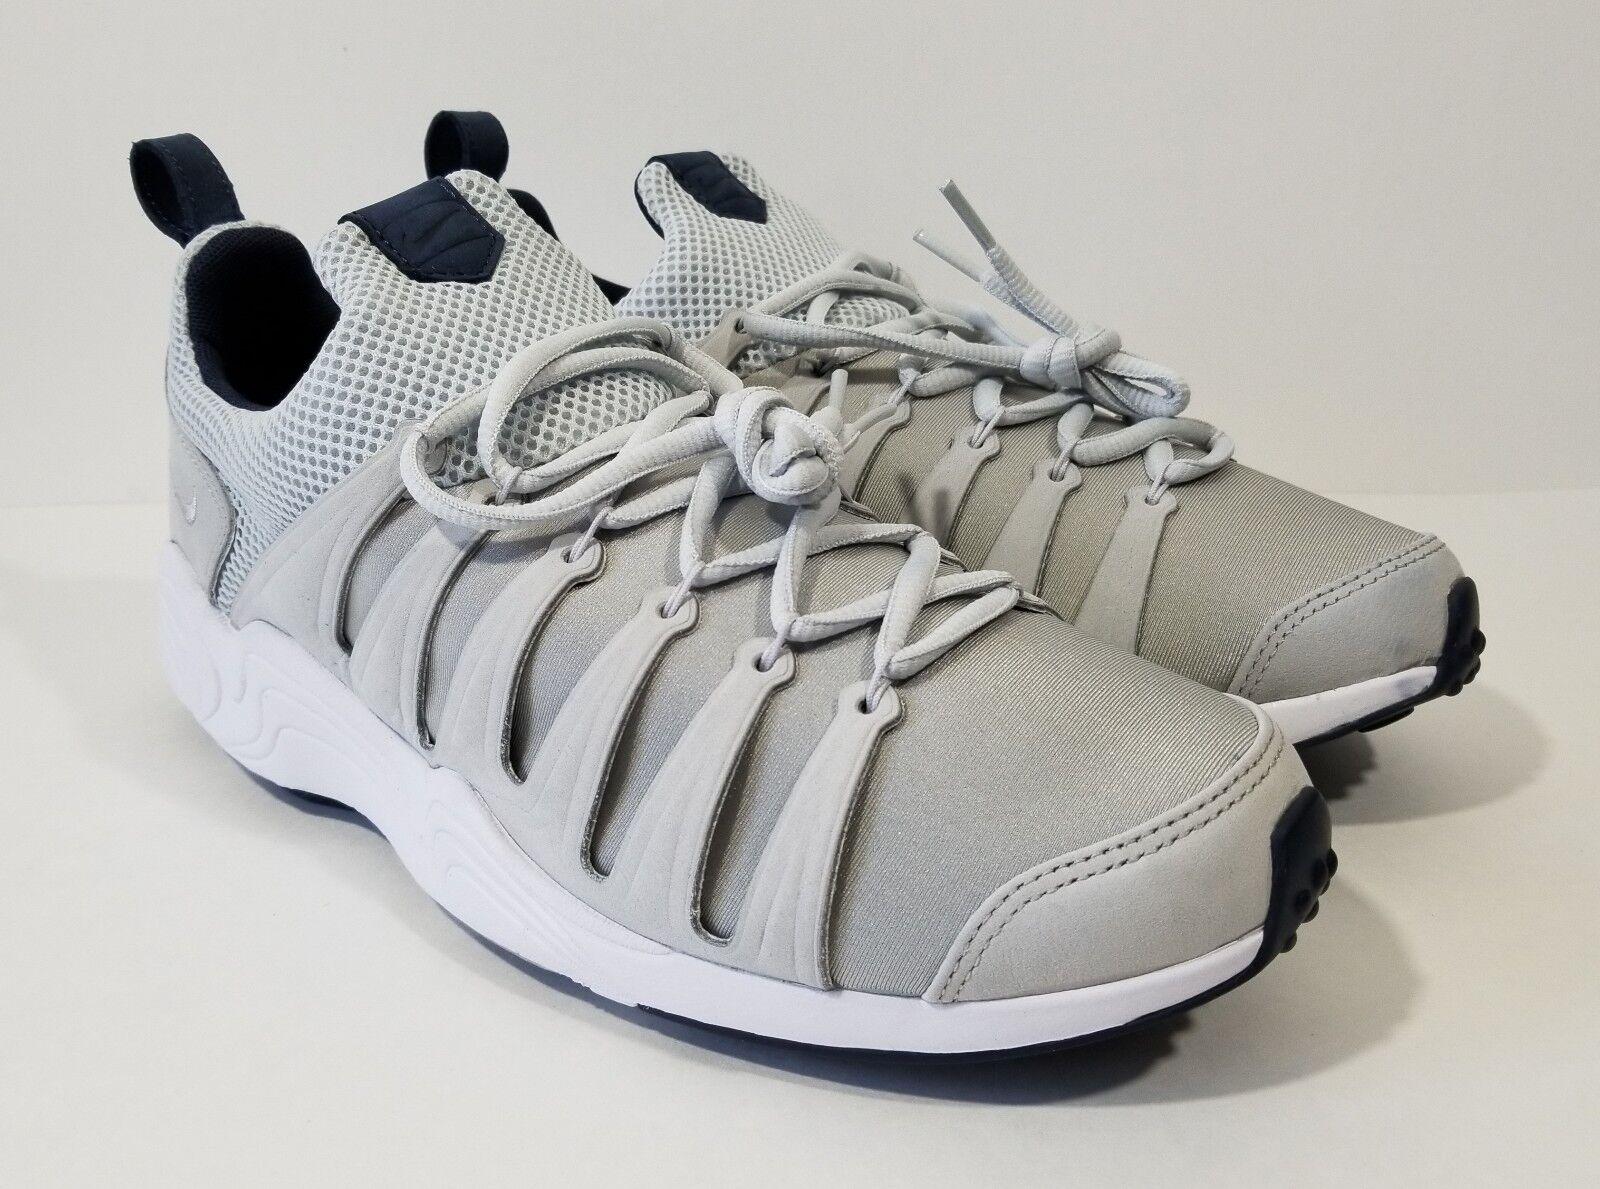 Nike Nike Nike Air Zoom Spirimic Mens Running shoes Grey White Size 10 4155da